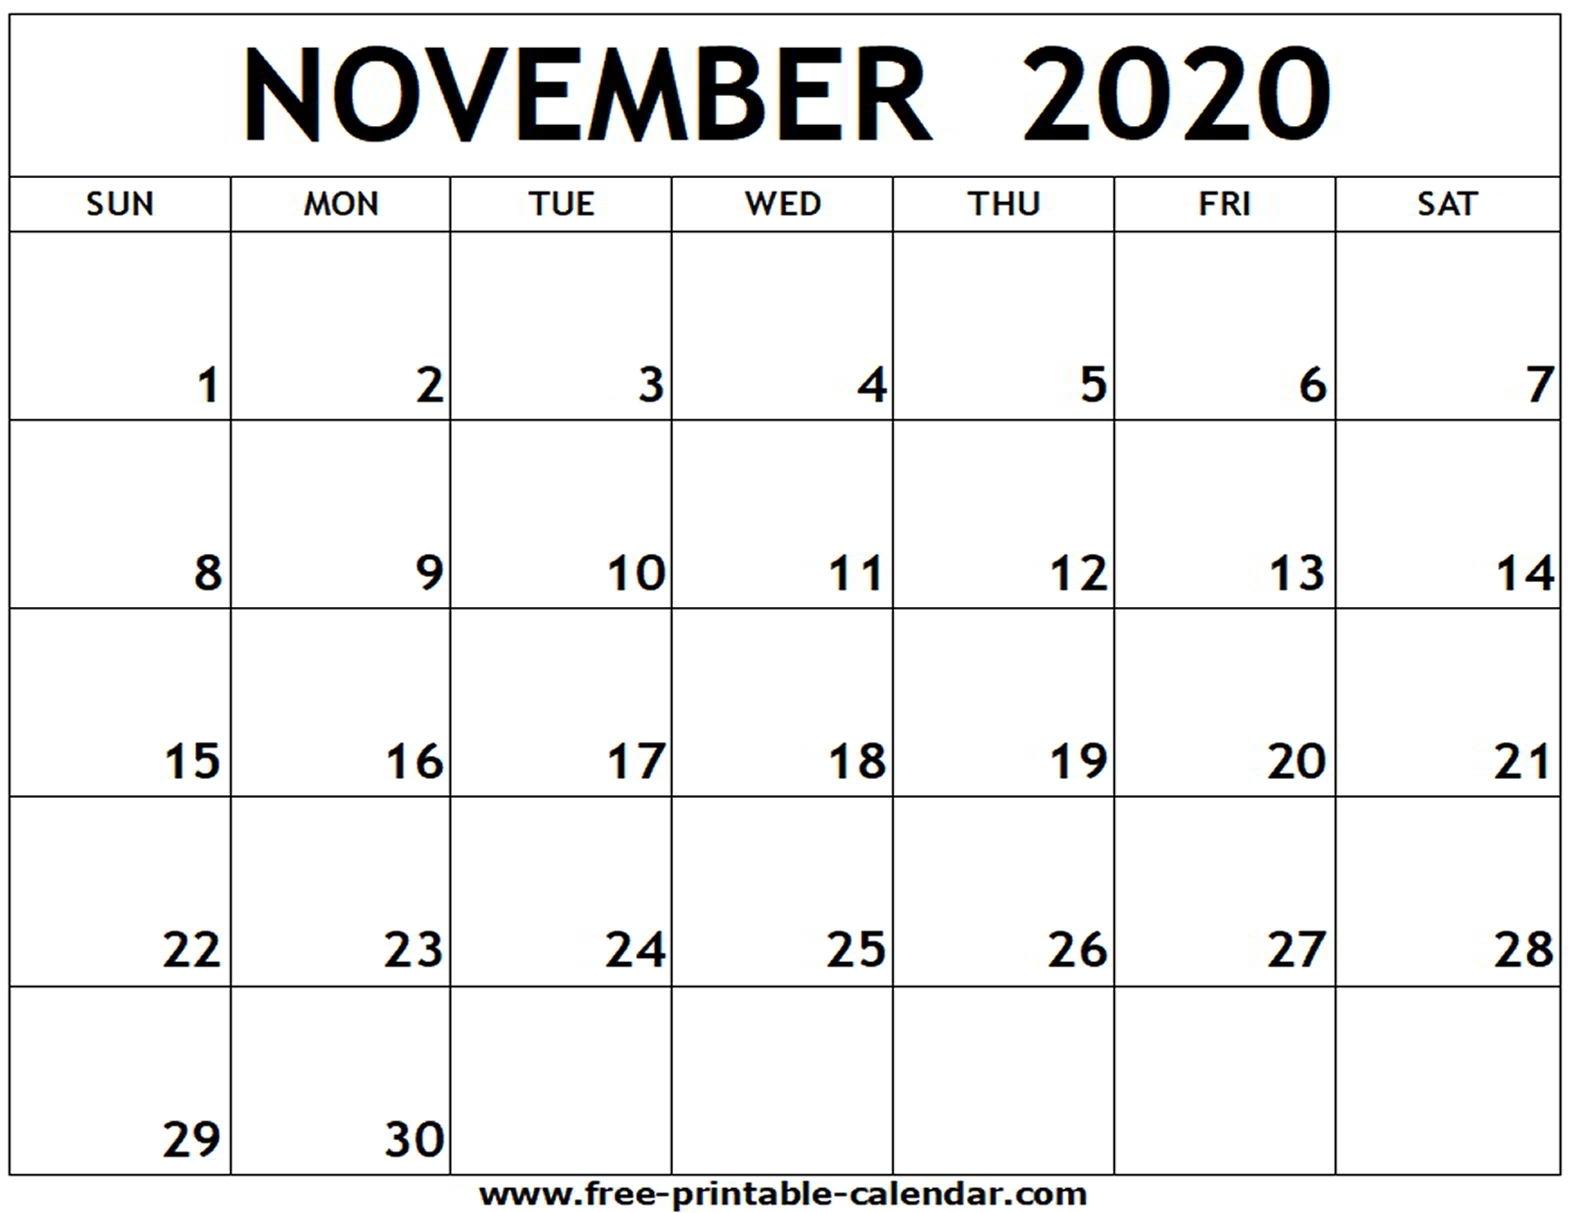 Printable Calendar November 2020 To December 2020 | Month